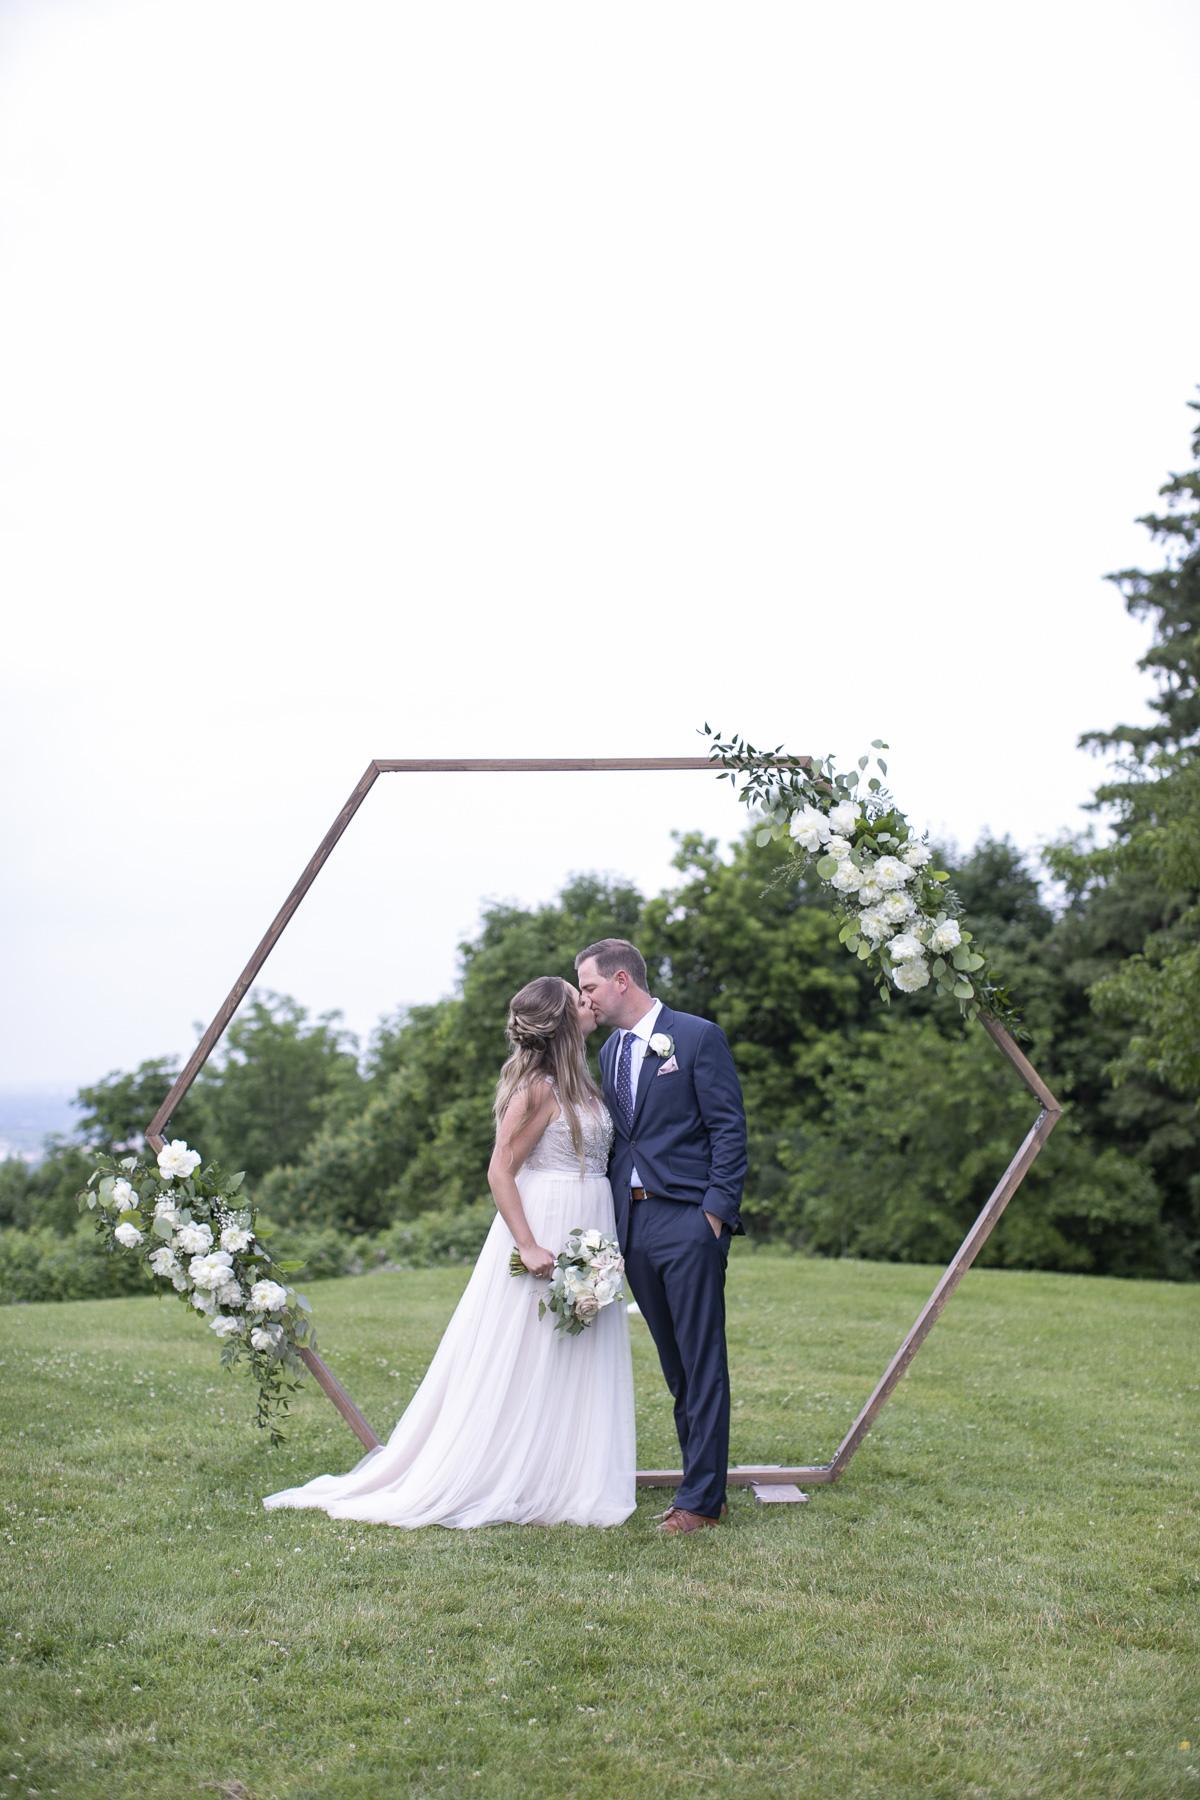 vineyard-bride-philosophy-studios-outdoor-summer-wedding-the-tamahaac-club-niagara-ancaster-toronto-vendor-0085.JPG